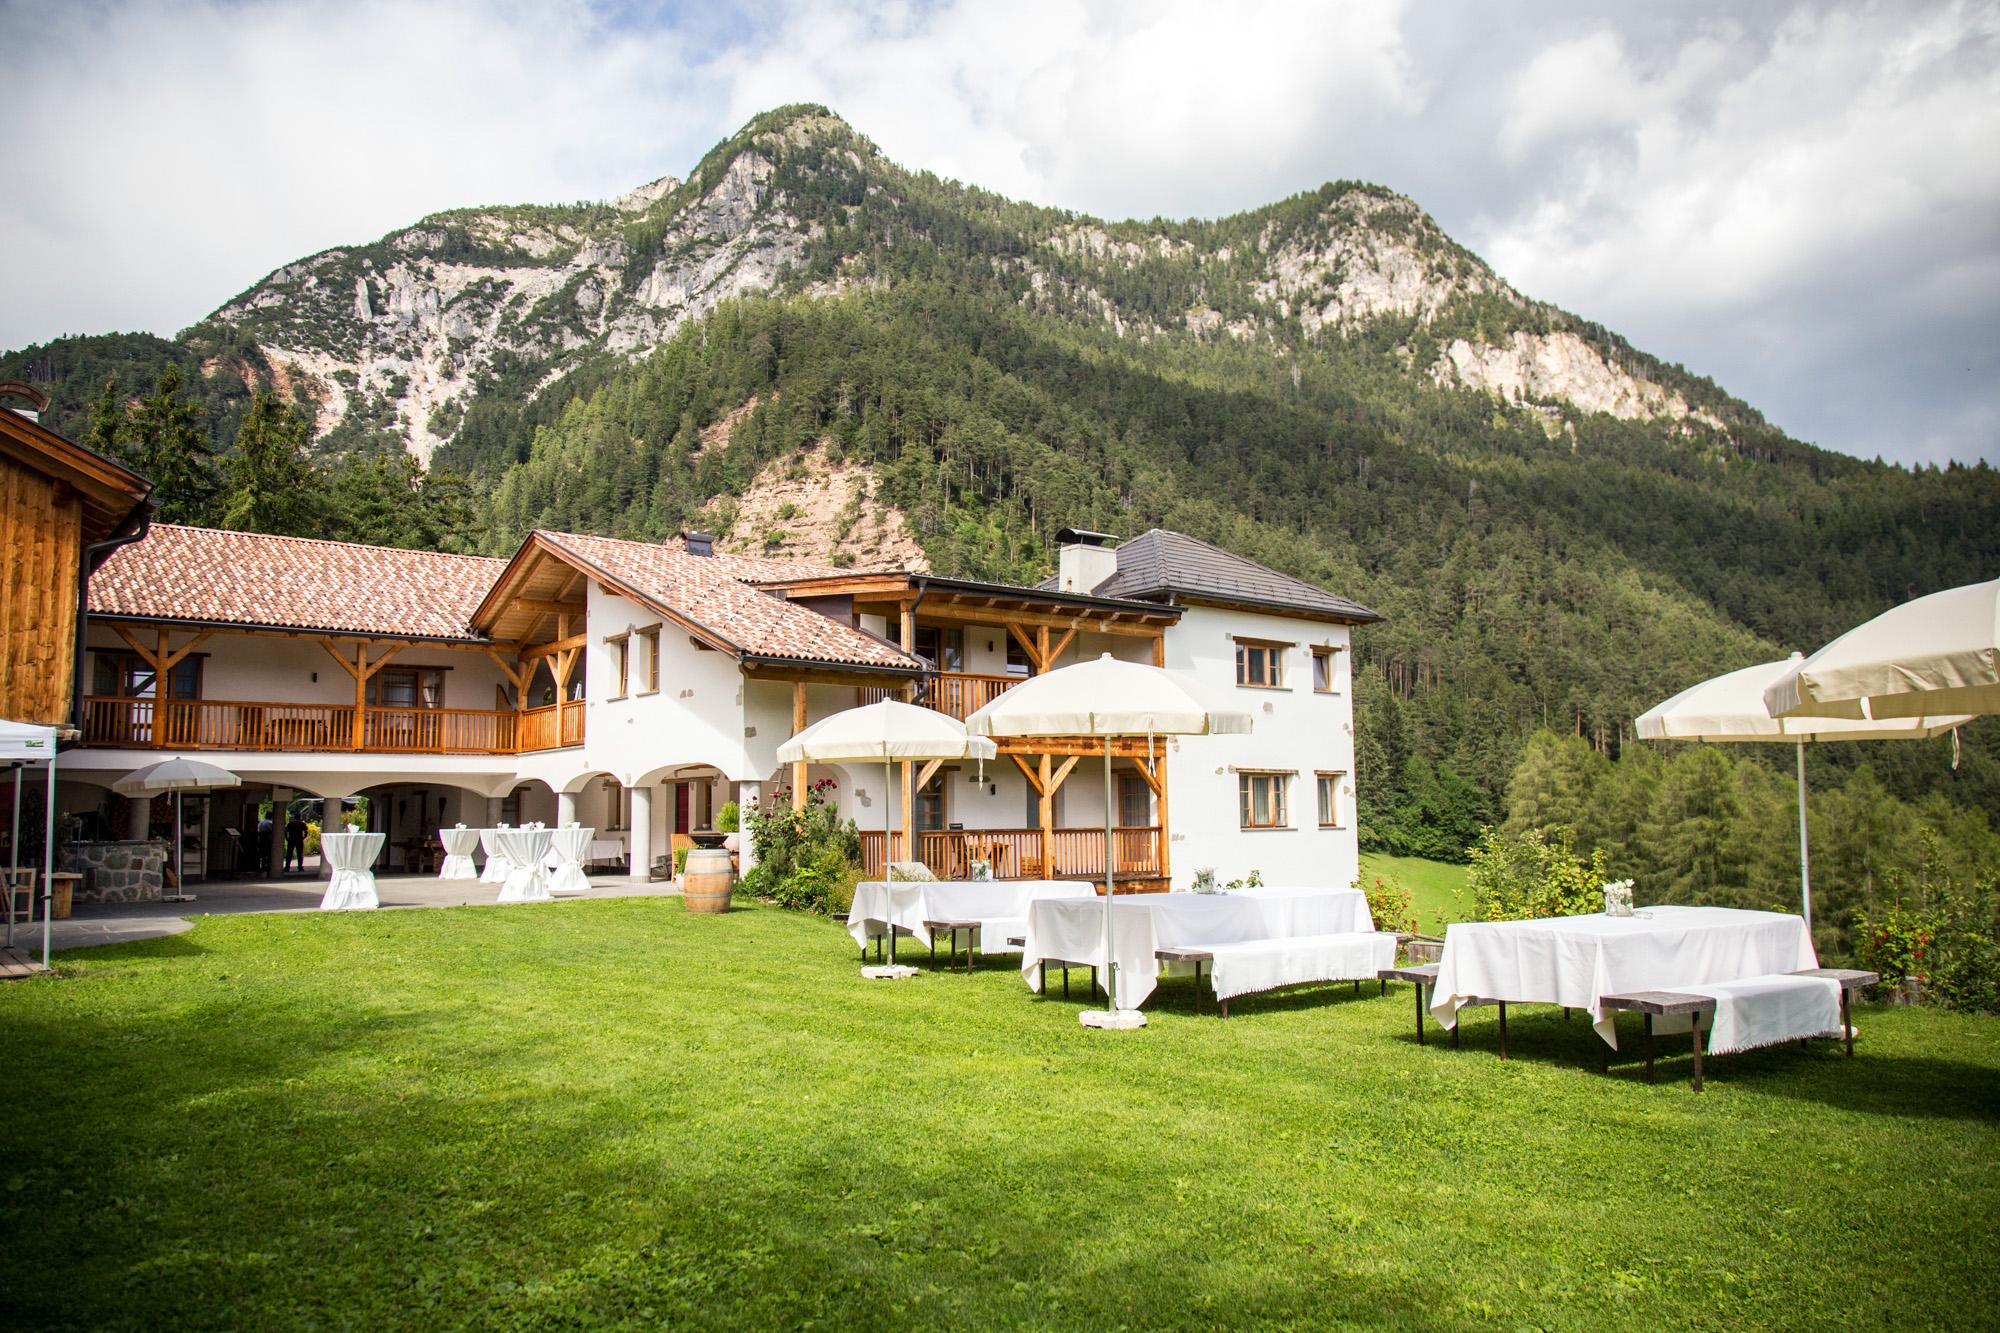 Ansitz Velseck | Tiers (BZ) - » Weddings